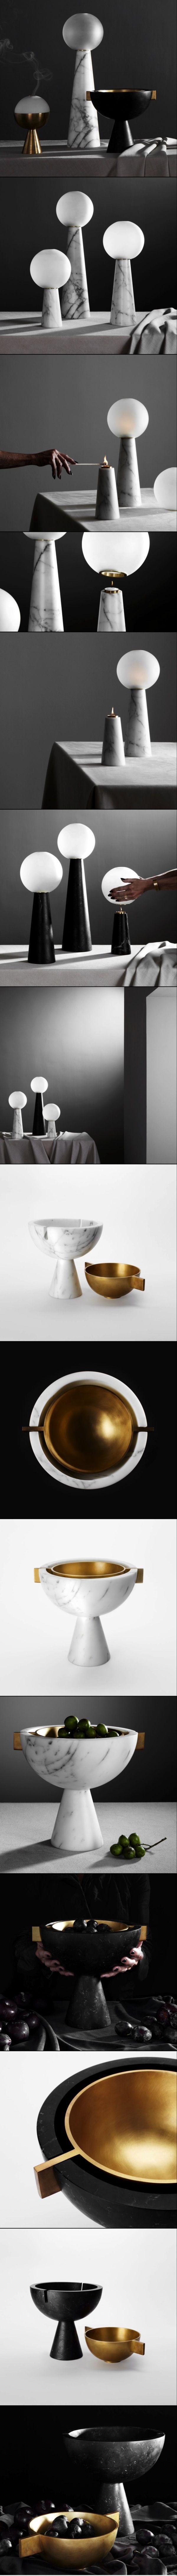 Apparatus Debuts New Italian Marble Objects - Design Milk